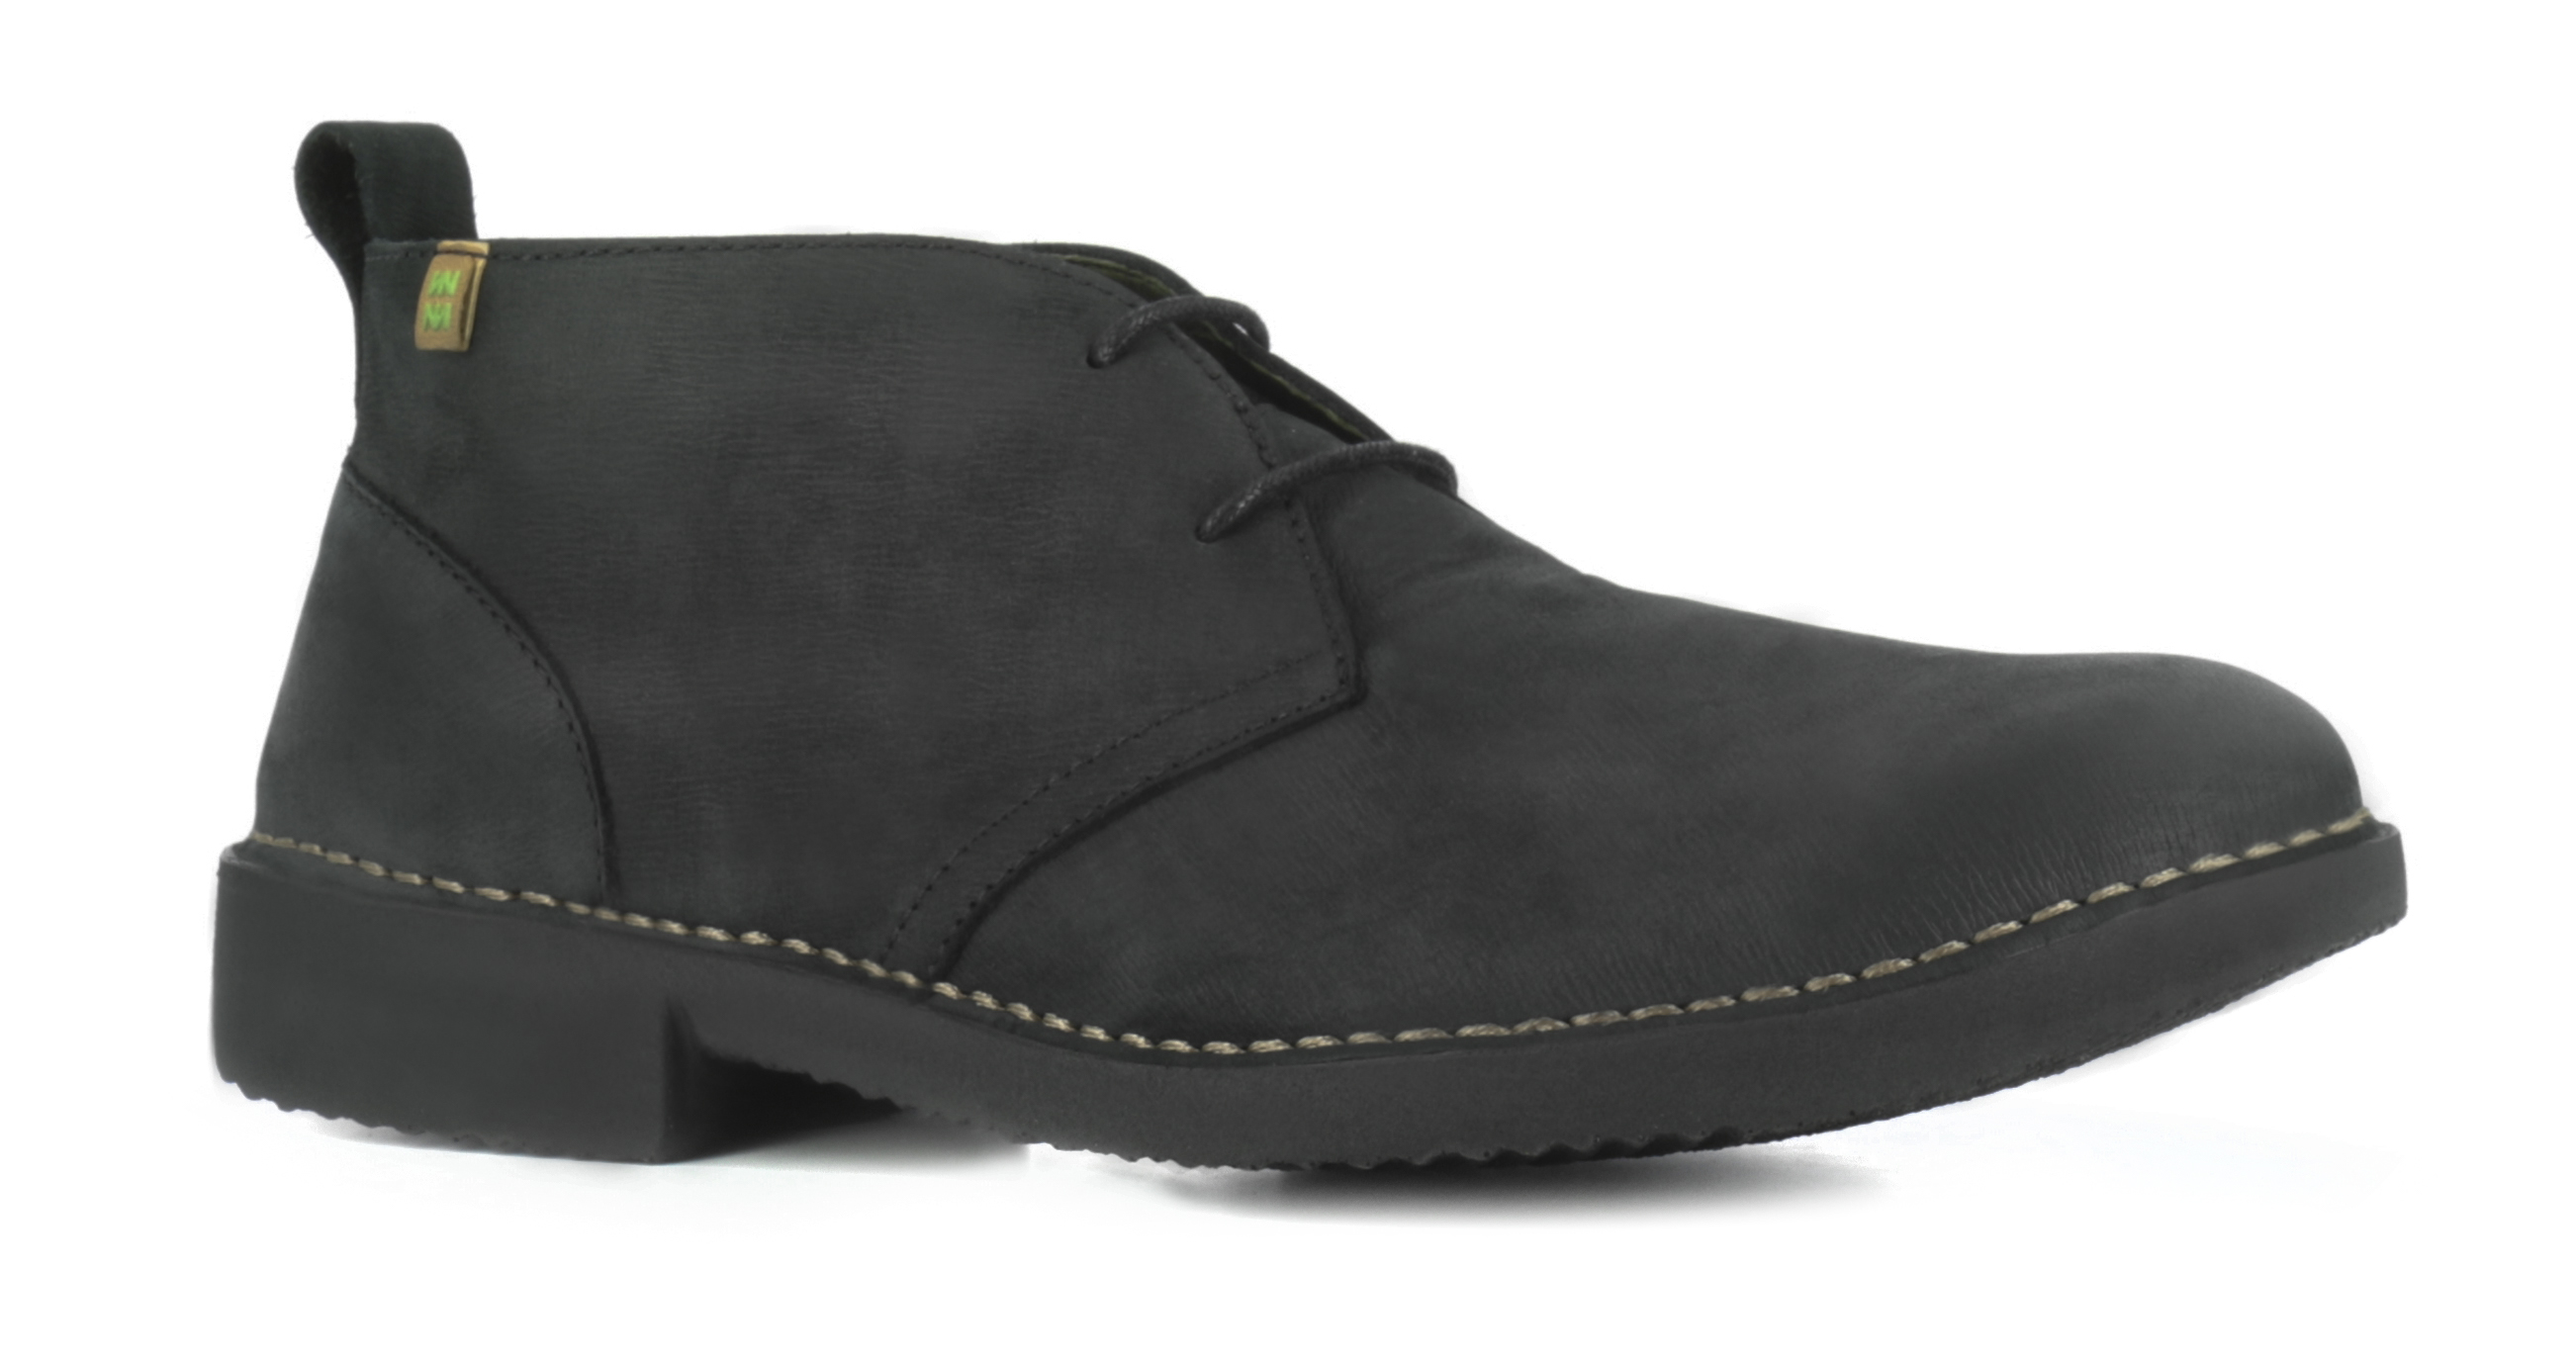 El Naturalista NG21 black lace-up leather shoes Eu 43